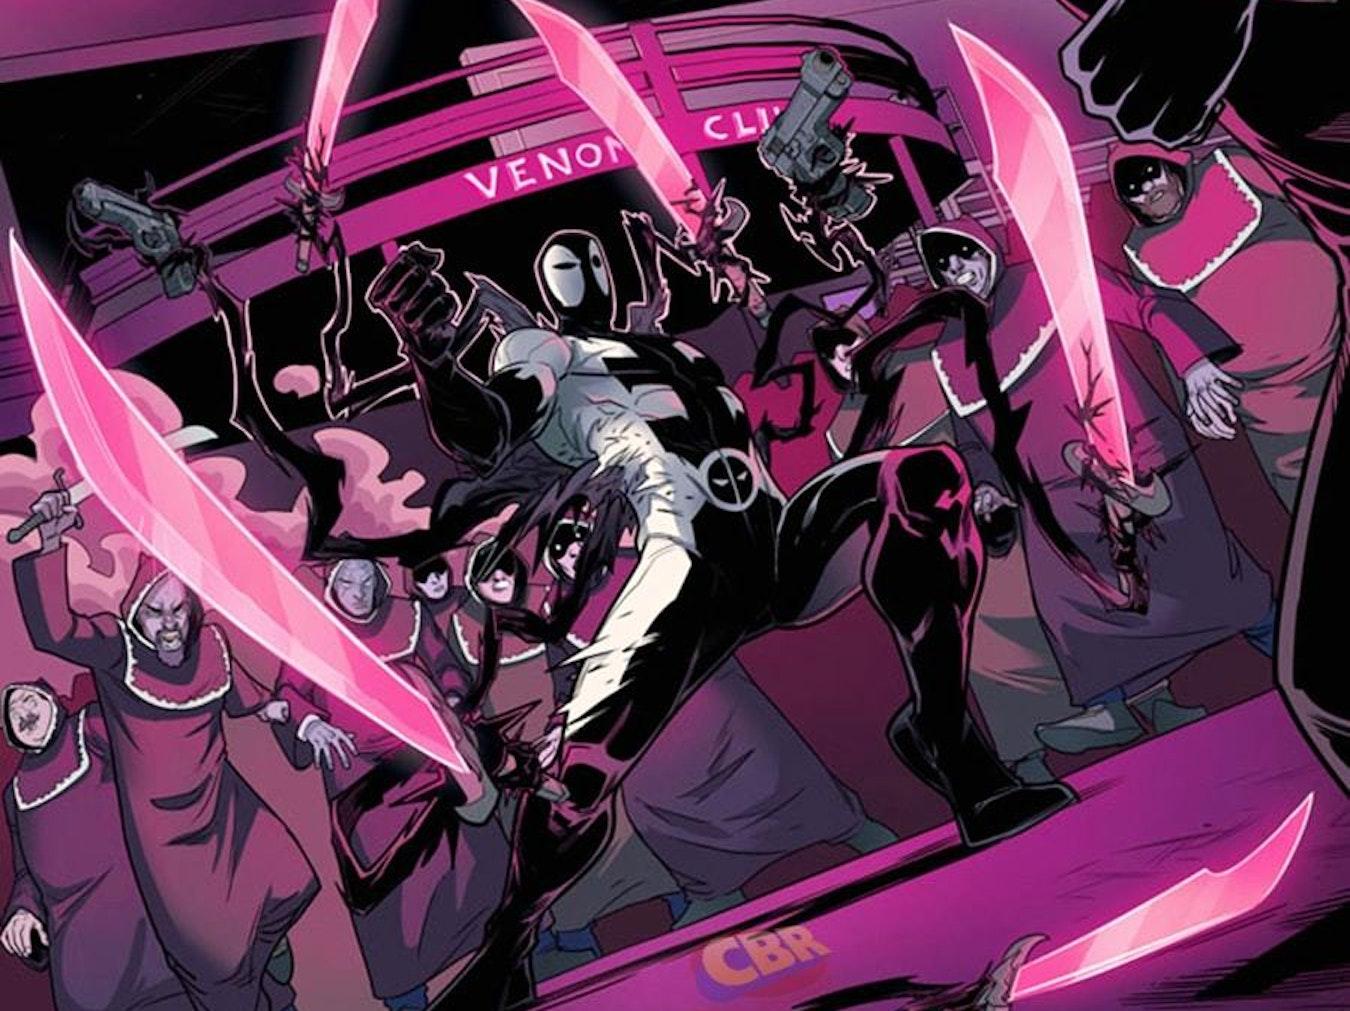 Preview from Cullen Bunn's Marvel Comic, Deadpool: Back in Black